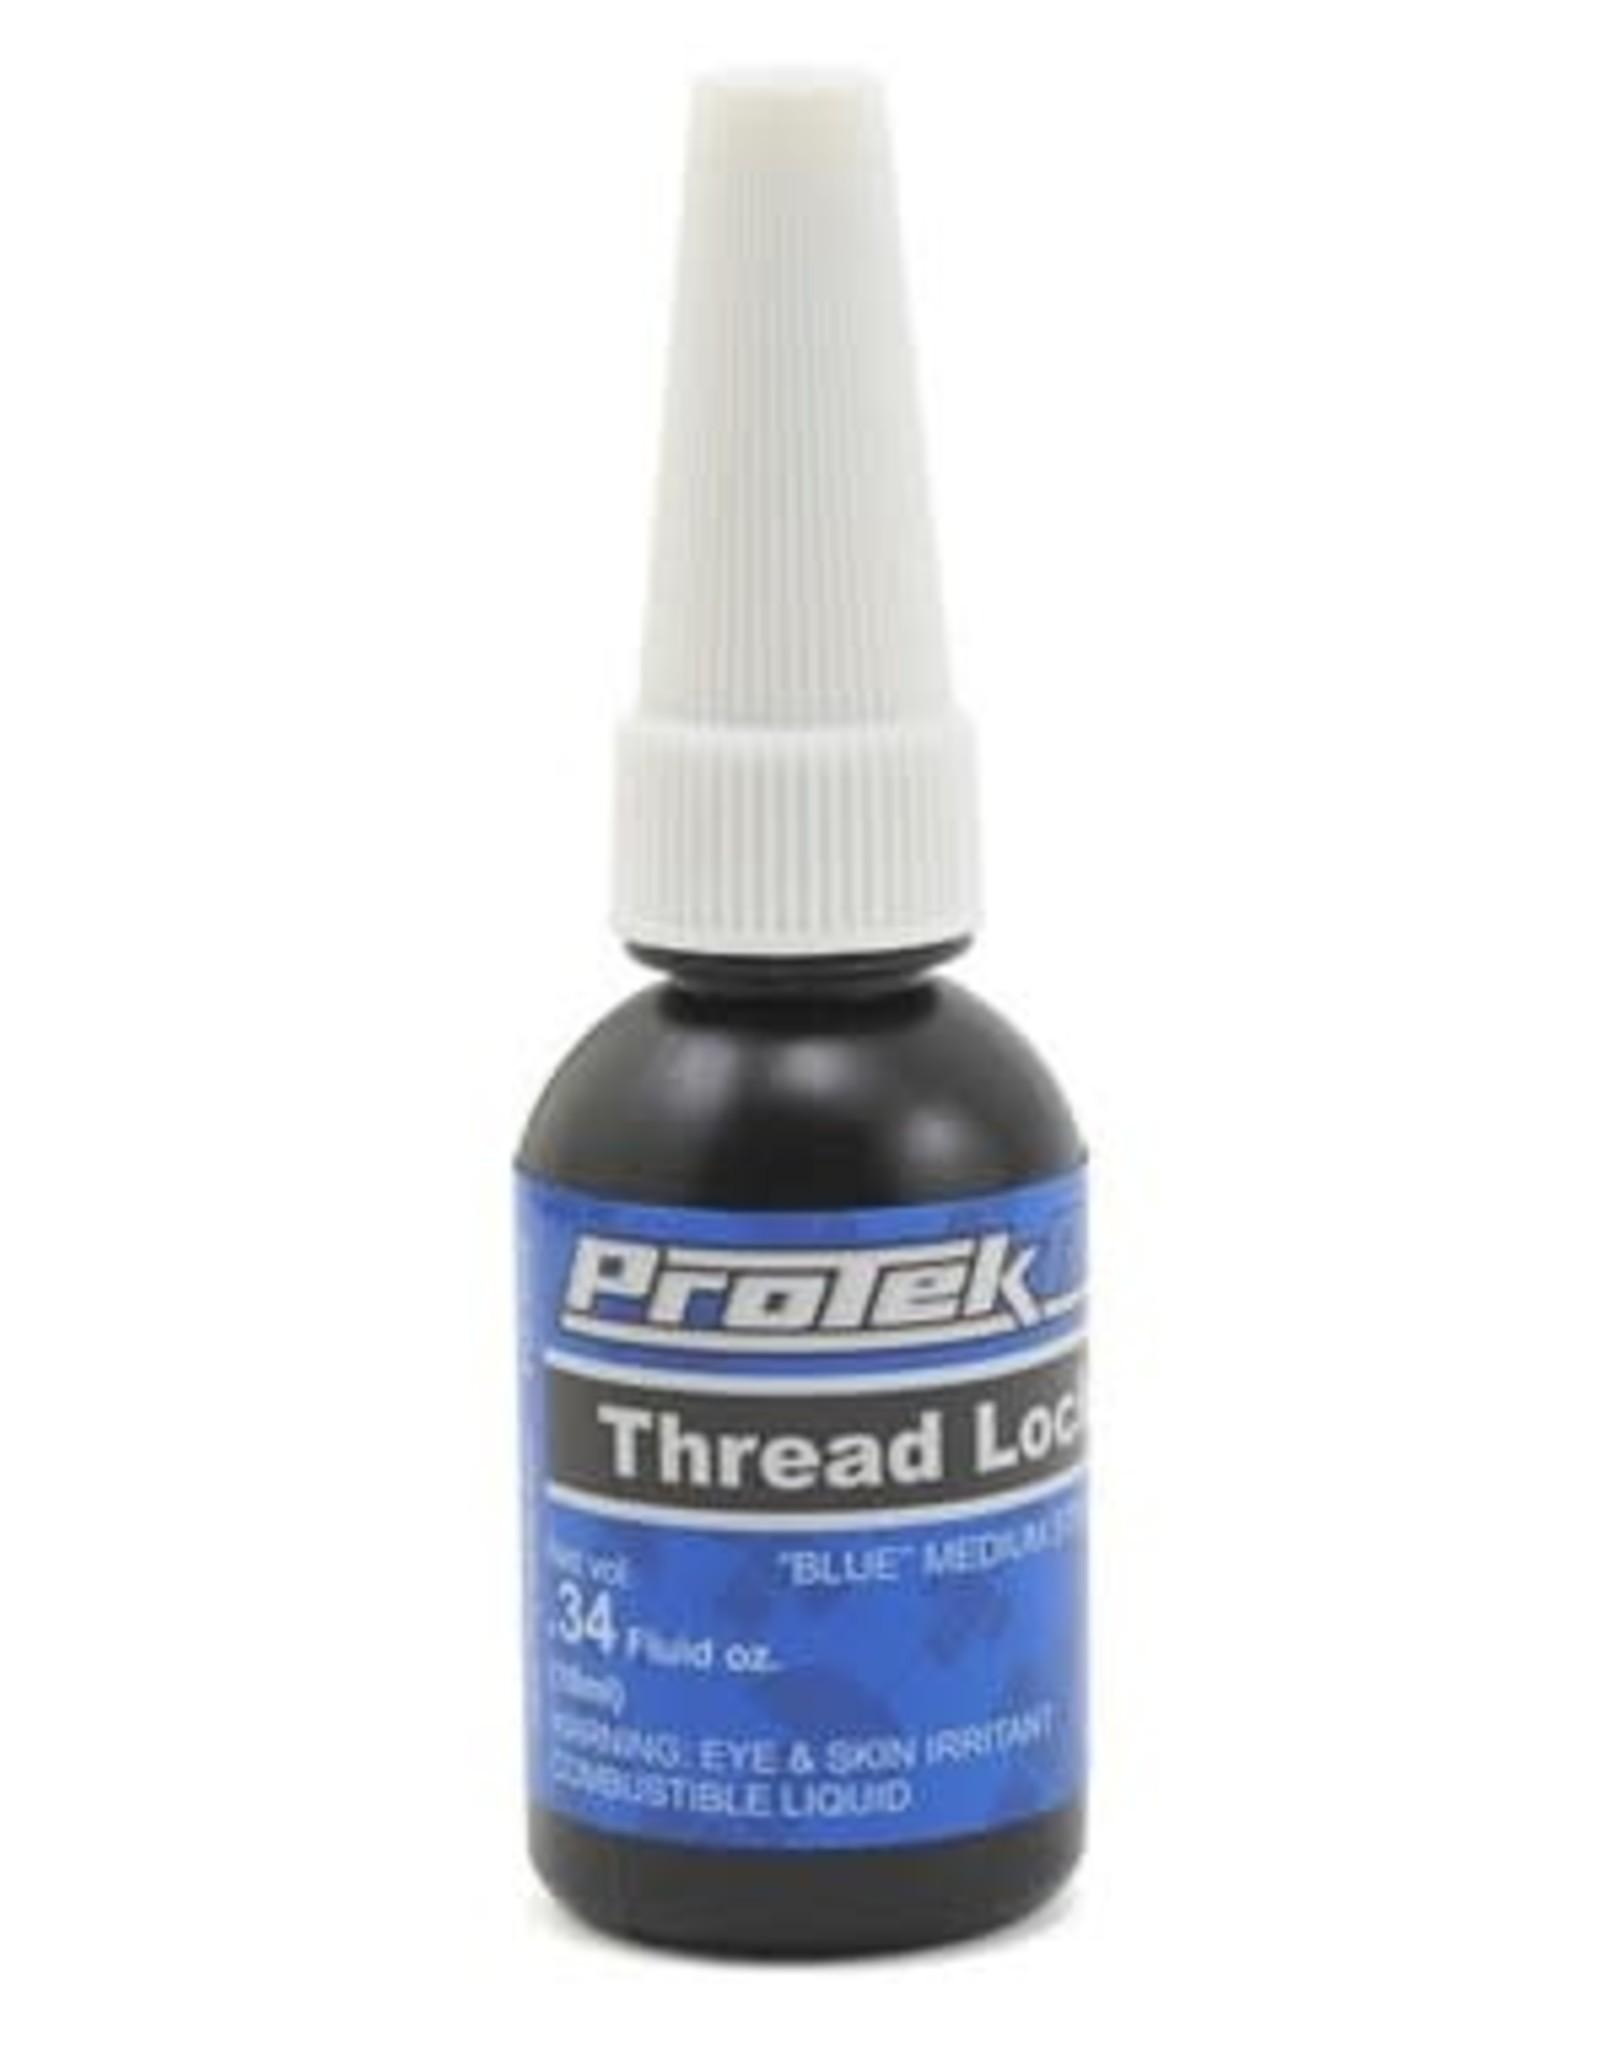 Protek RC ProTek RC Blue Thread Lock (Medium) (0.34oz)